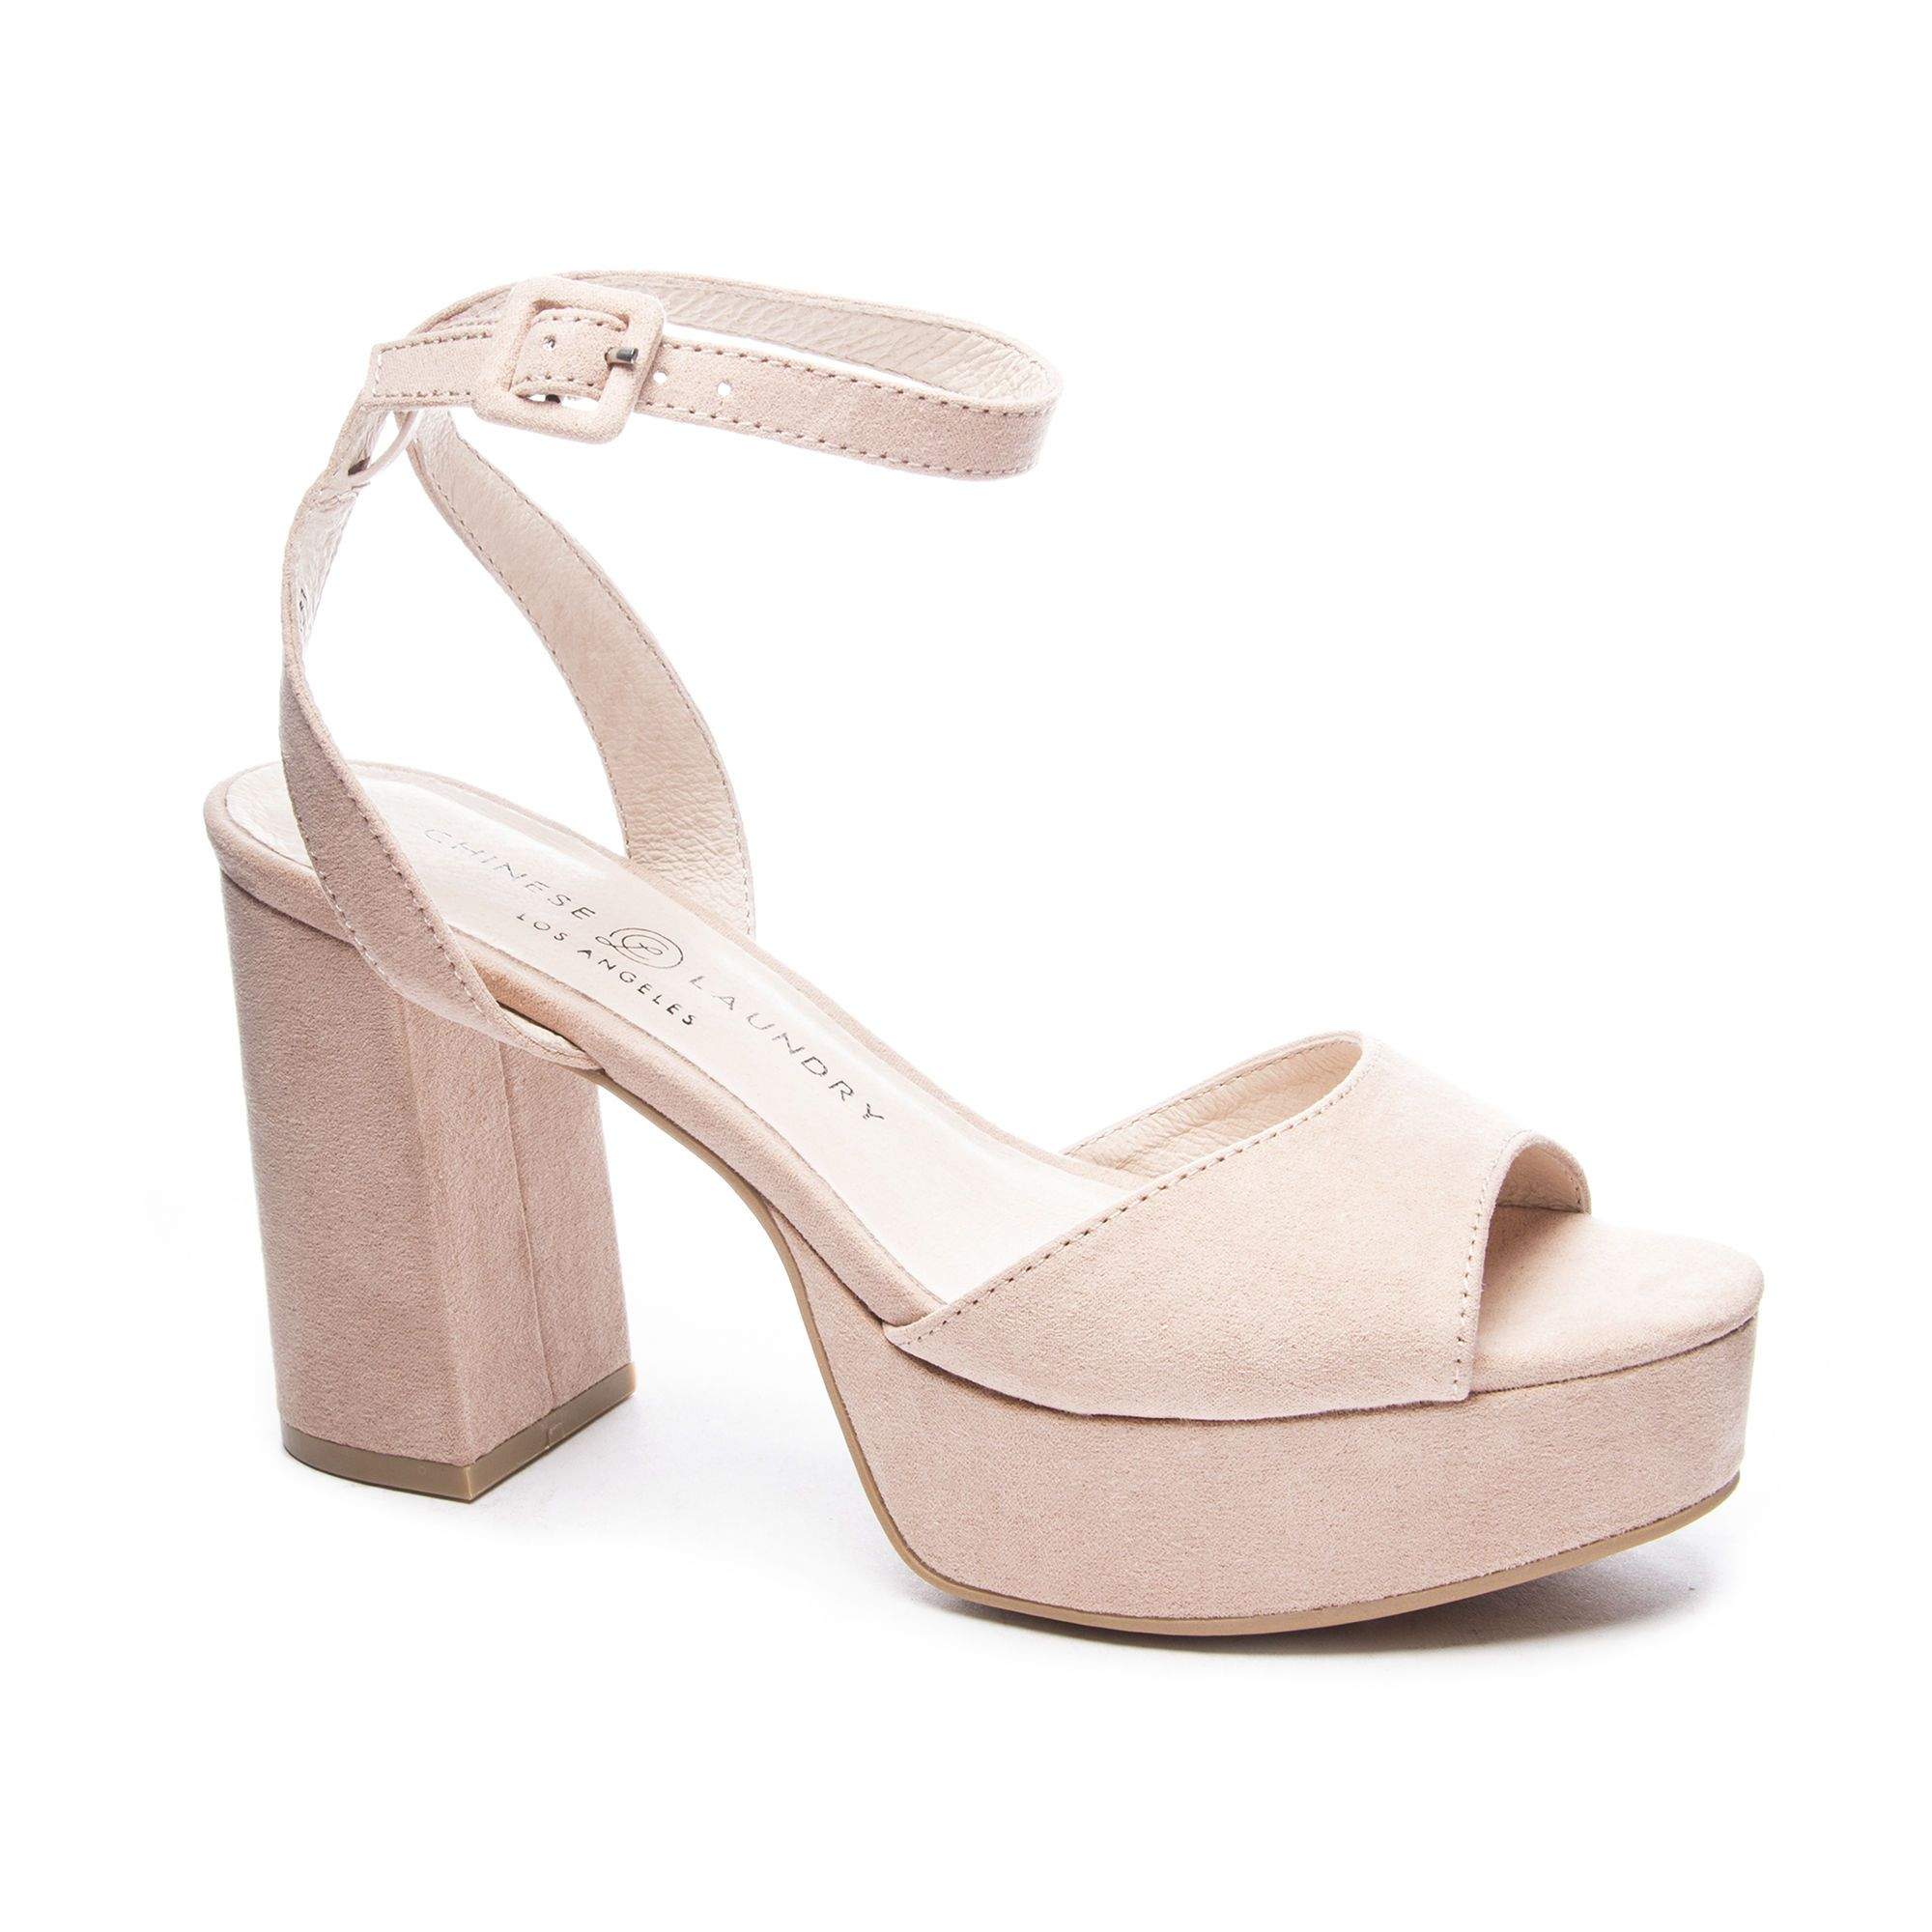 Theresa Platform Sandal Heels Womens High Heels Low Block Heel